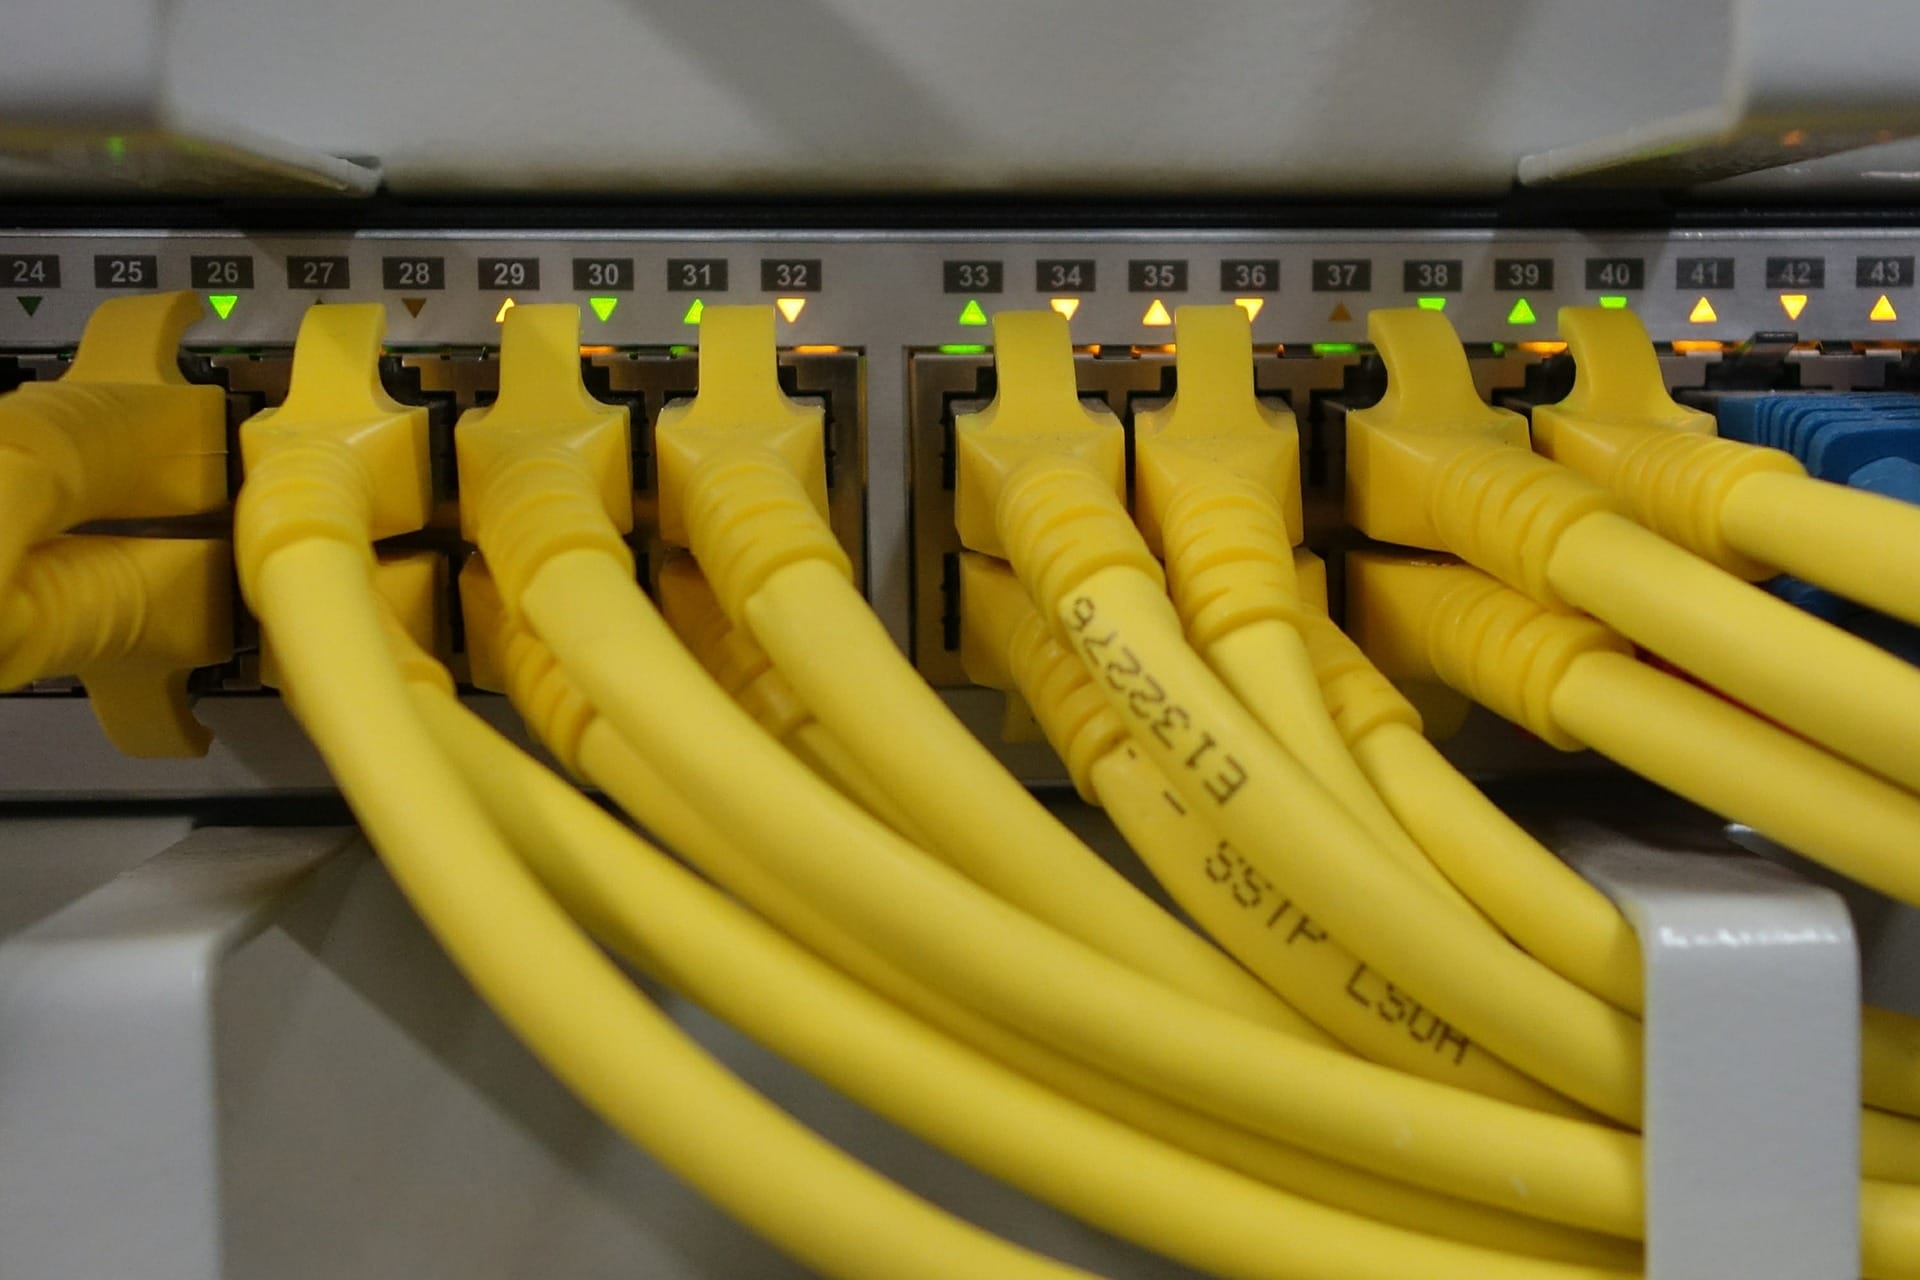 che cos'è Ethernet